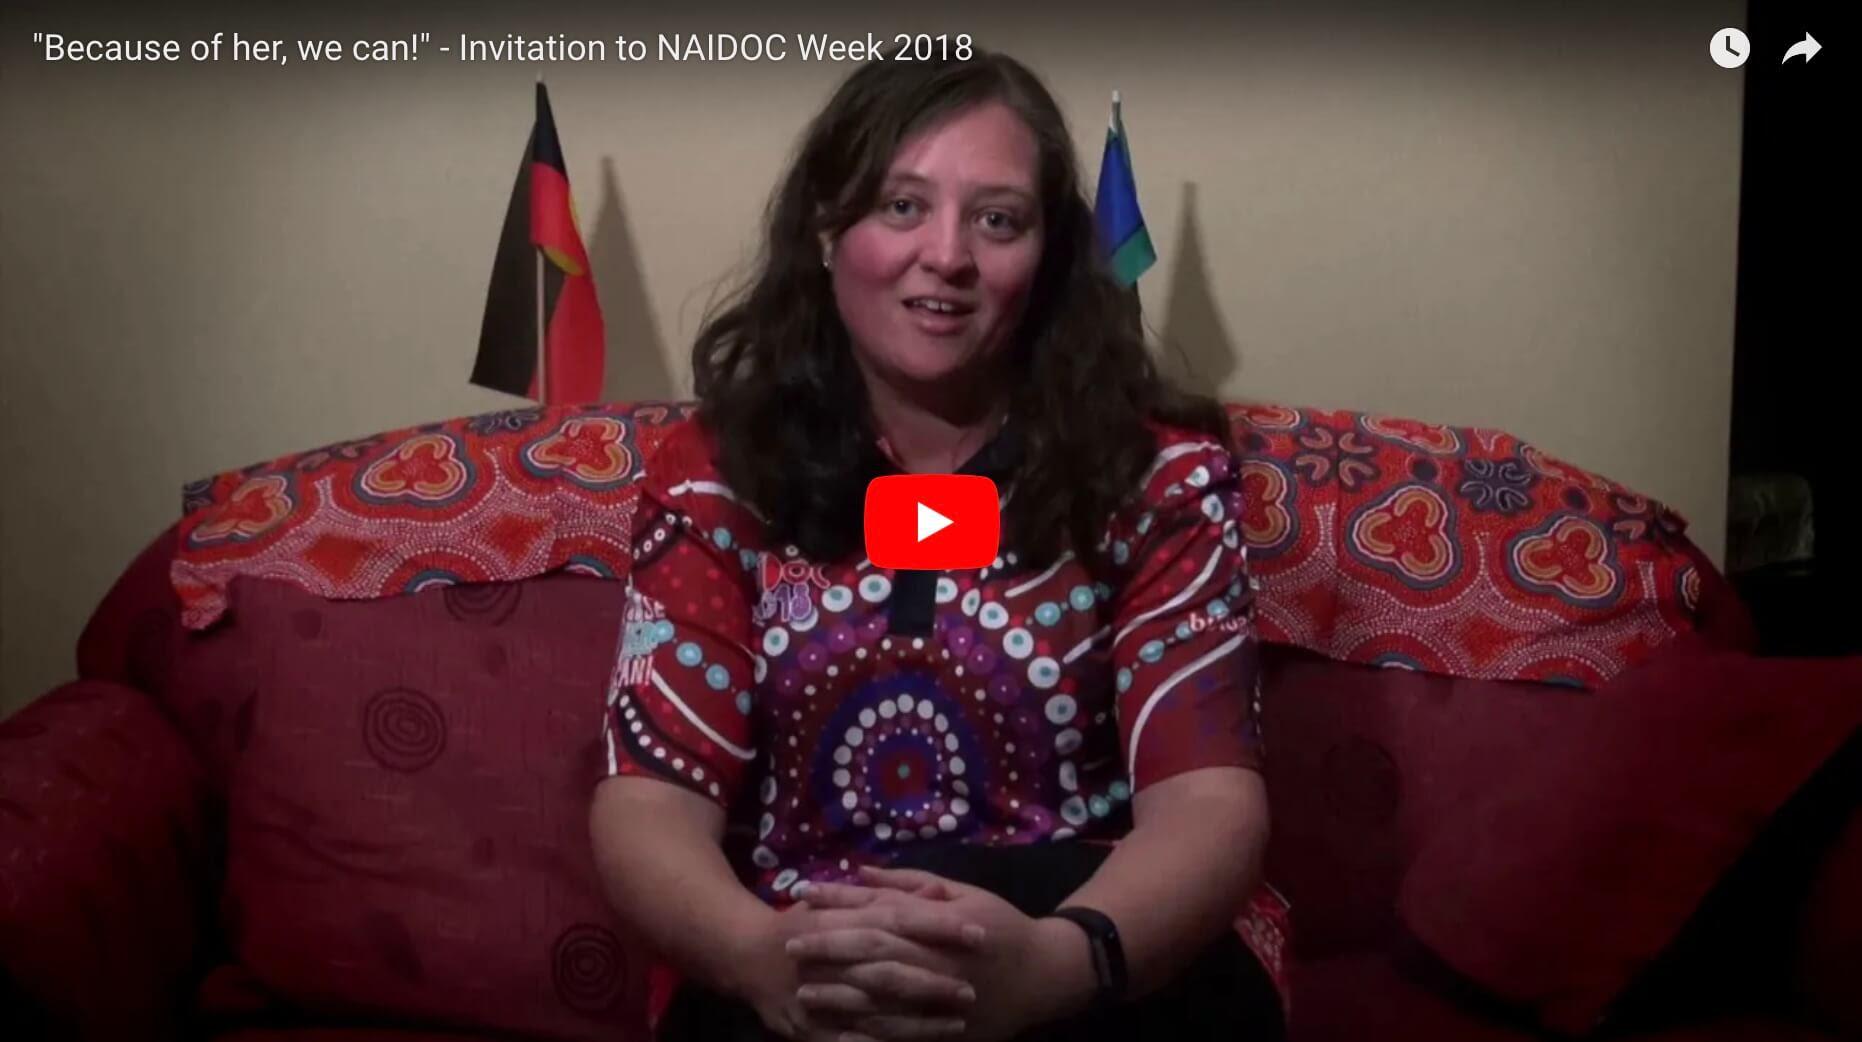 Video: Brooke Prentis invites us to NAIDOC Week